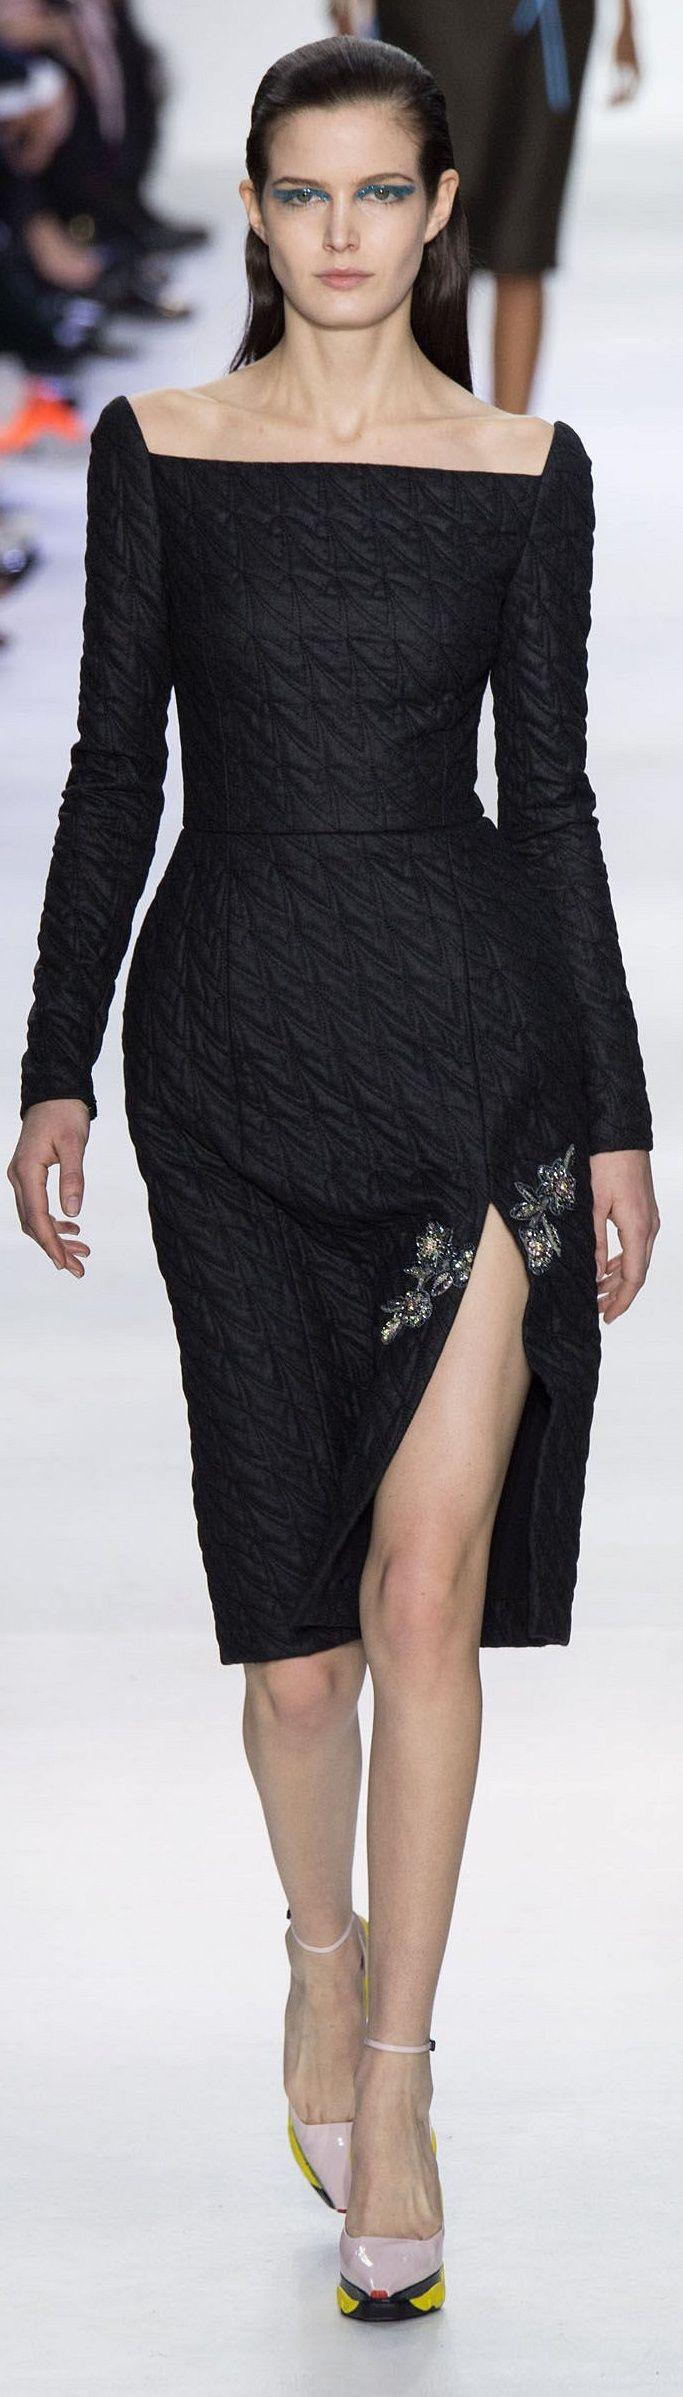 Christian Dior cruise | #highfashion #inspiration #moderndesign luxury design, luxury, fashion. Visit www.memoir.pt